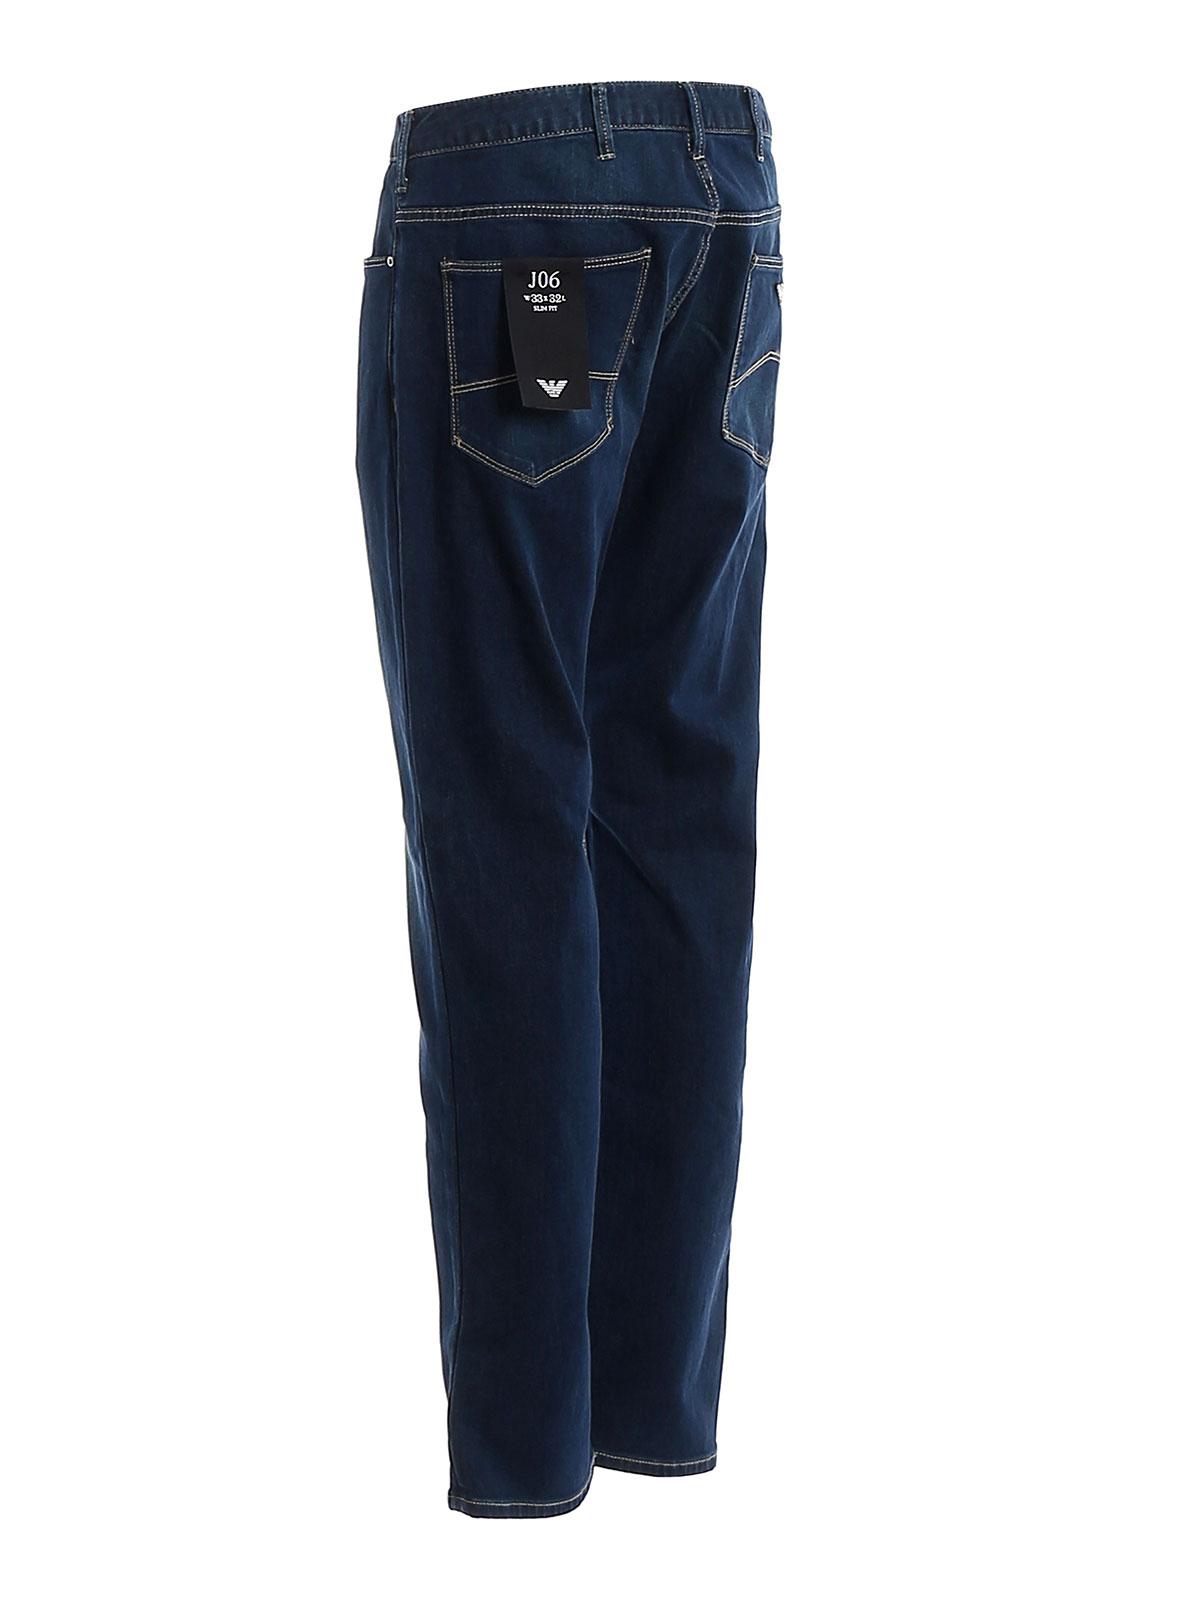 Picture of EMPORIO ARMANI | Men's 5 Pockets Stretch Jeans J06